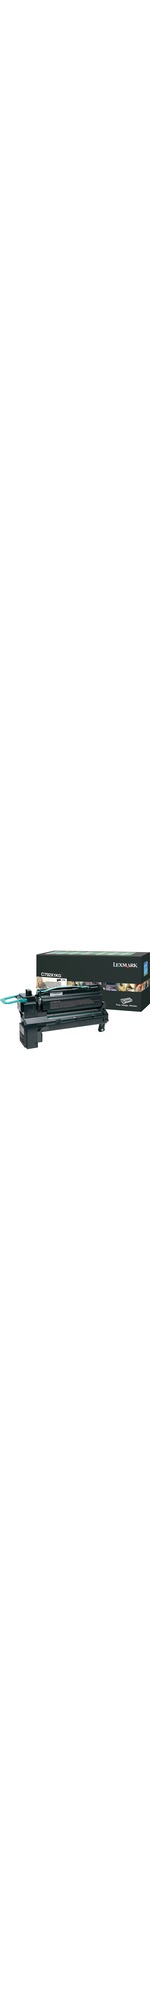 Lexmark C792X1KG Toner Cartridge - Black